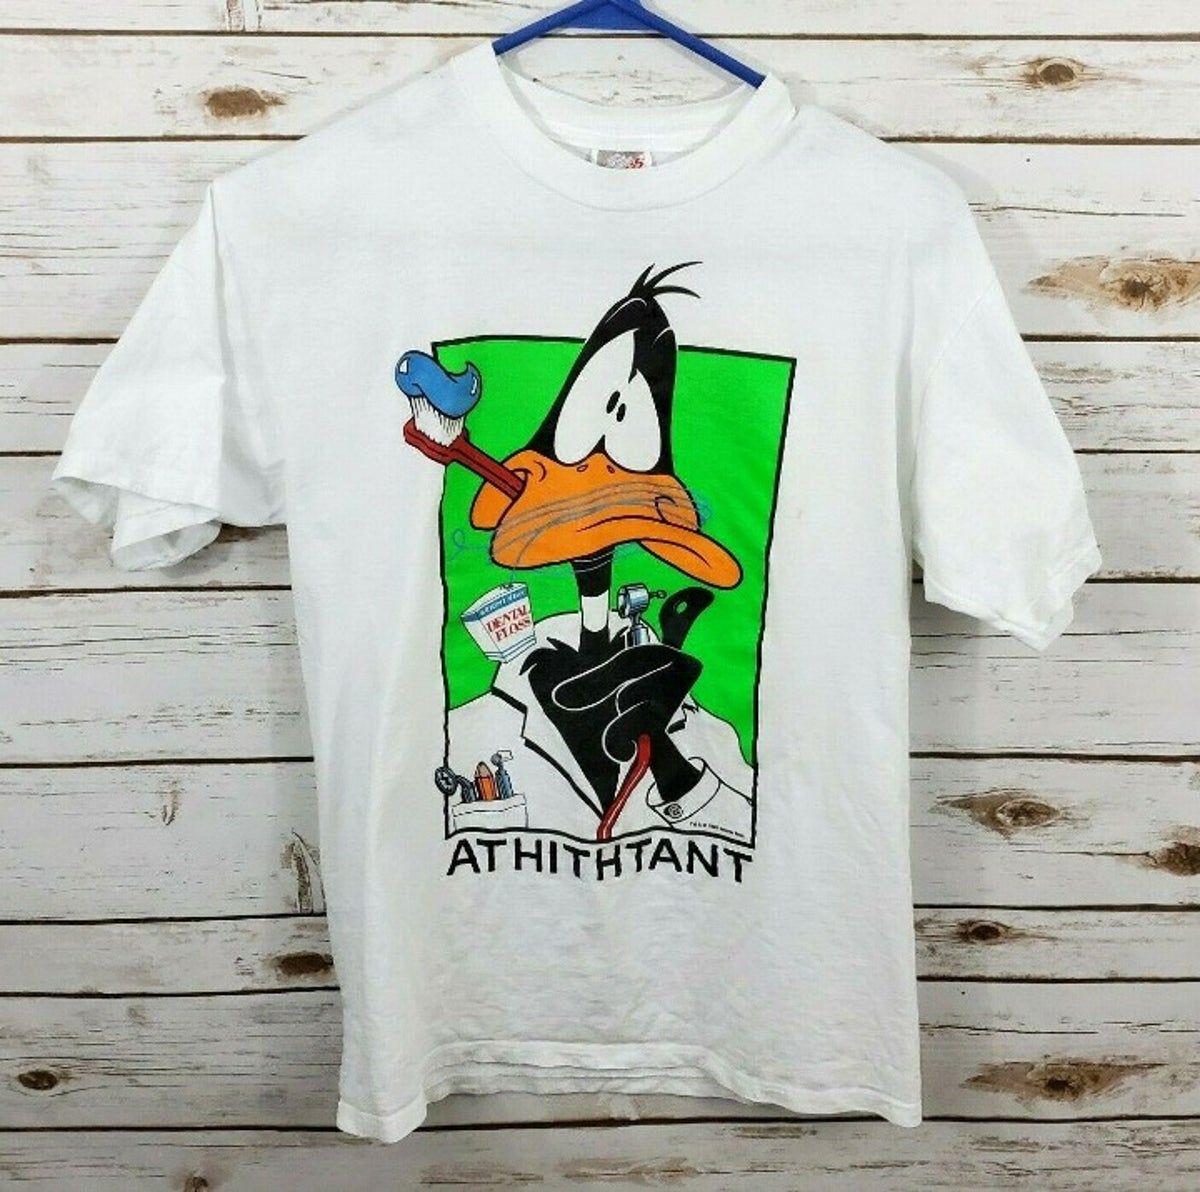 Vintage 1995 90s Daffy Duck Warner Bros T Shirt Daffy Duck Mens Tops